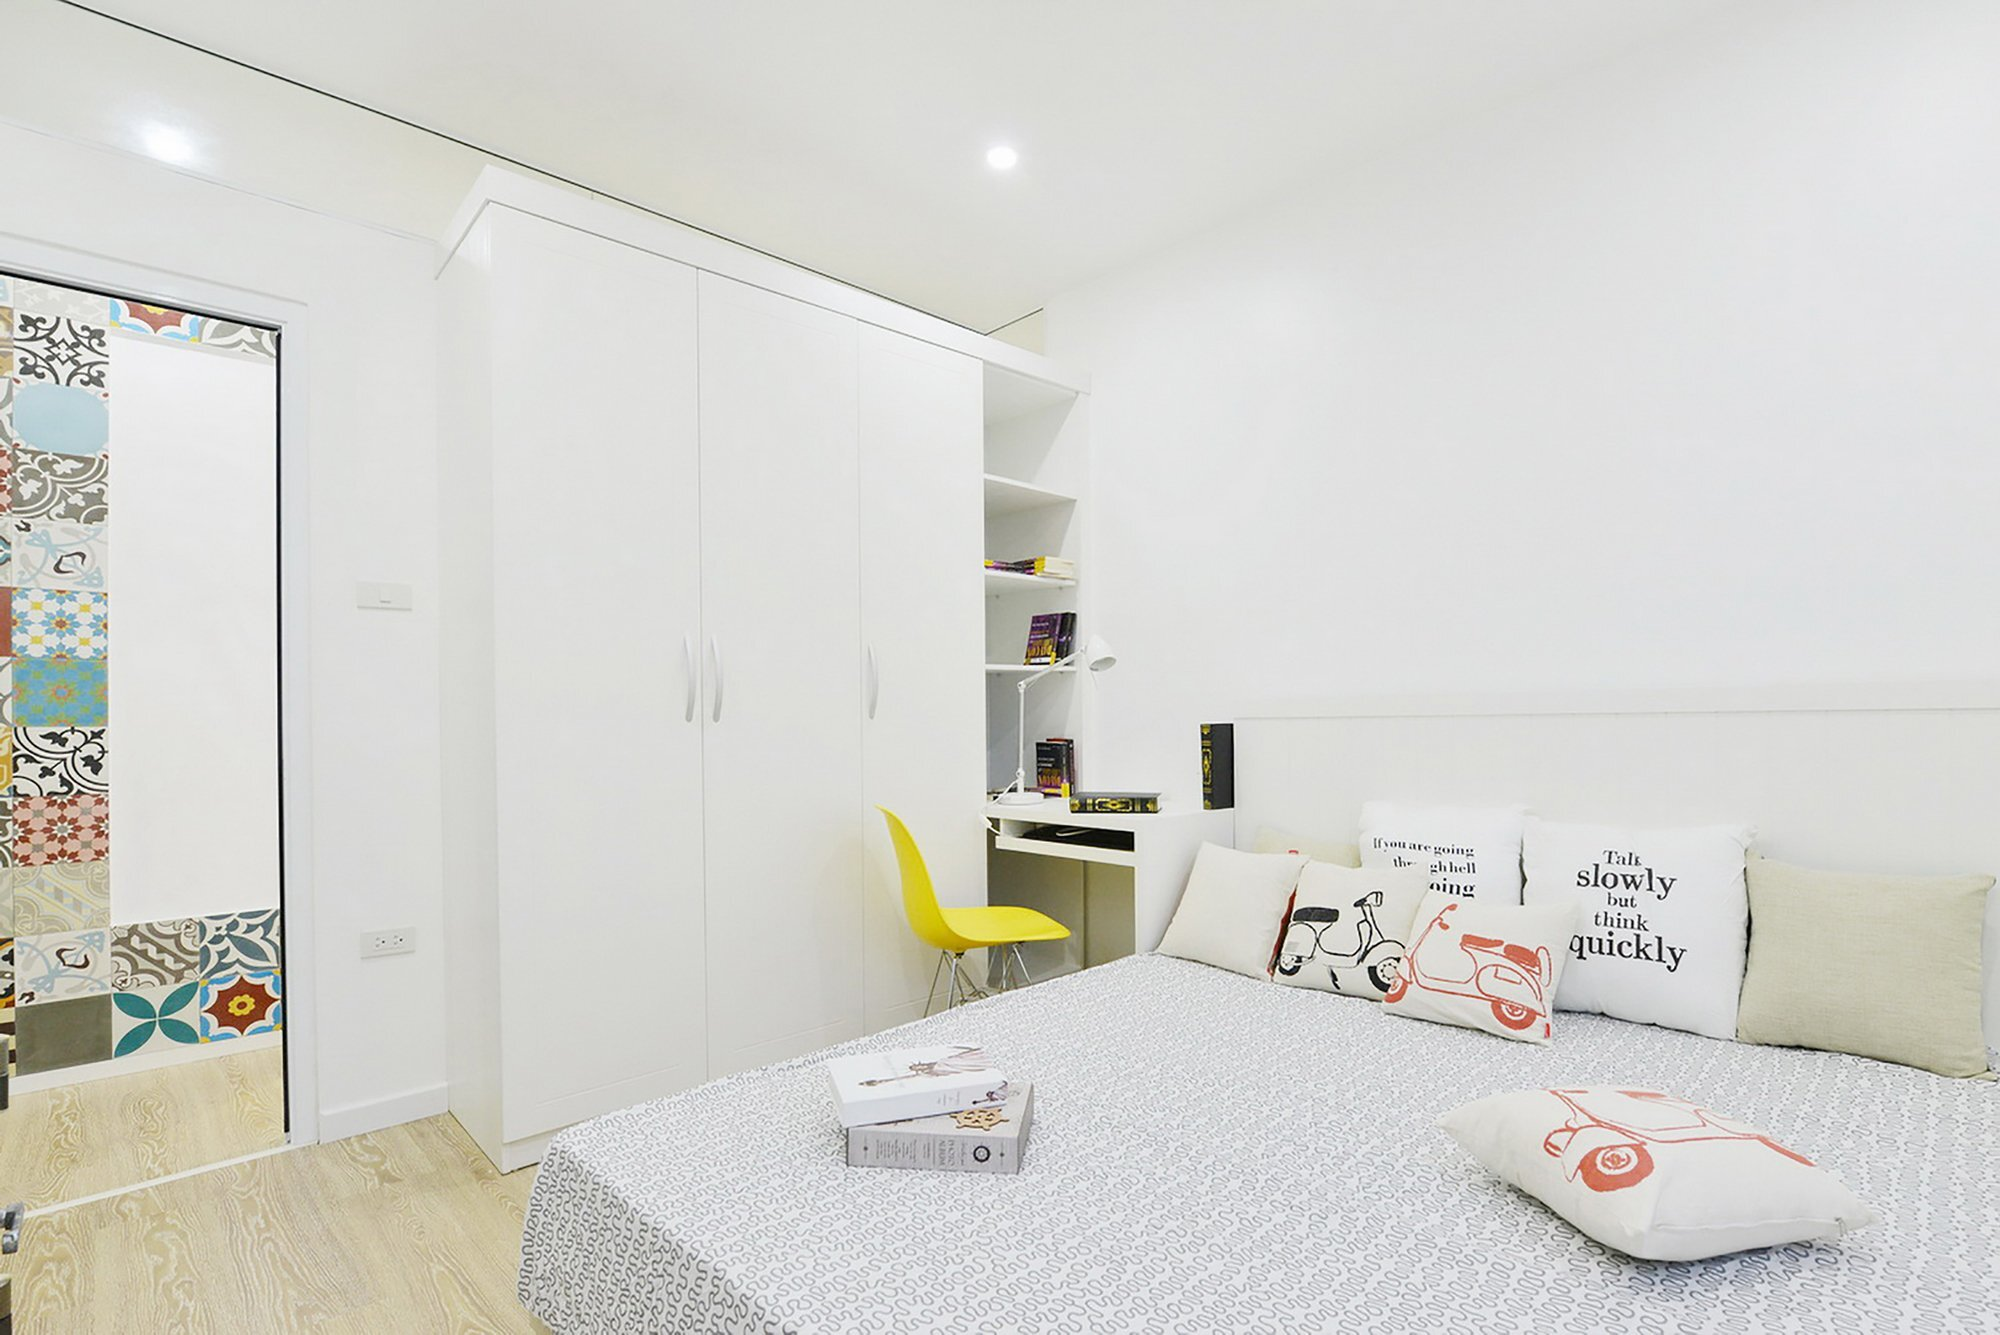 HT Apartment - Landmak Architect - Hanoi - Vietnam - Small Apartment - Bedroom - Humble Homes